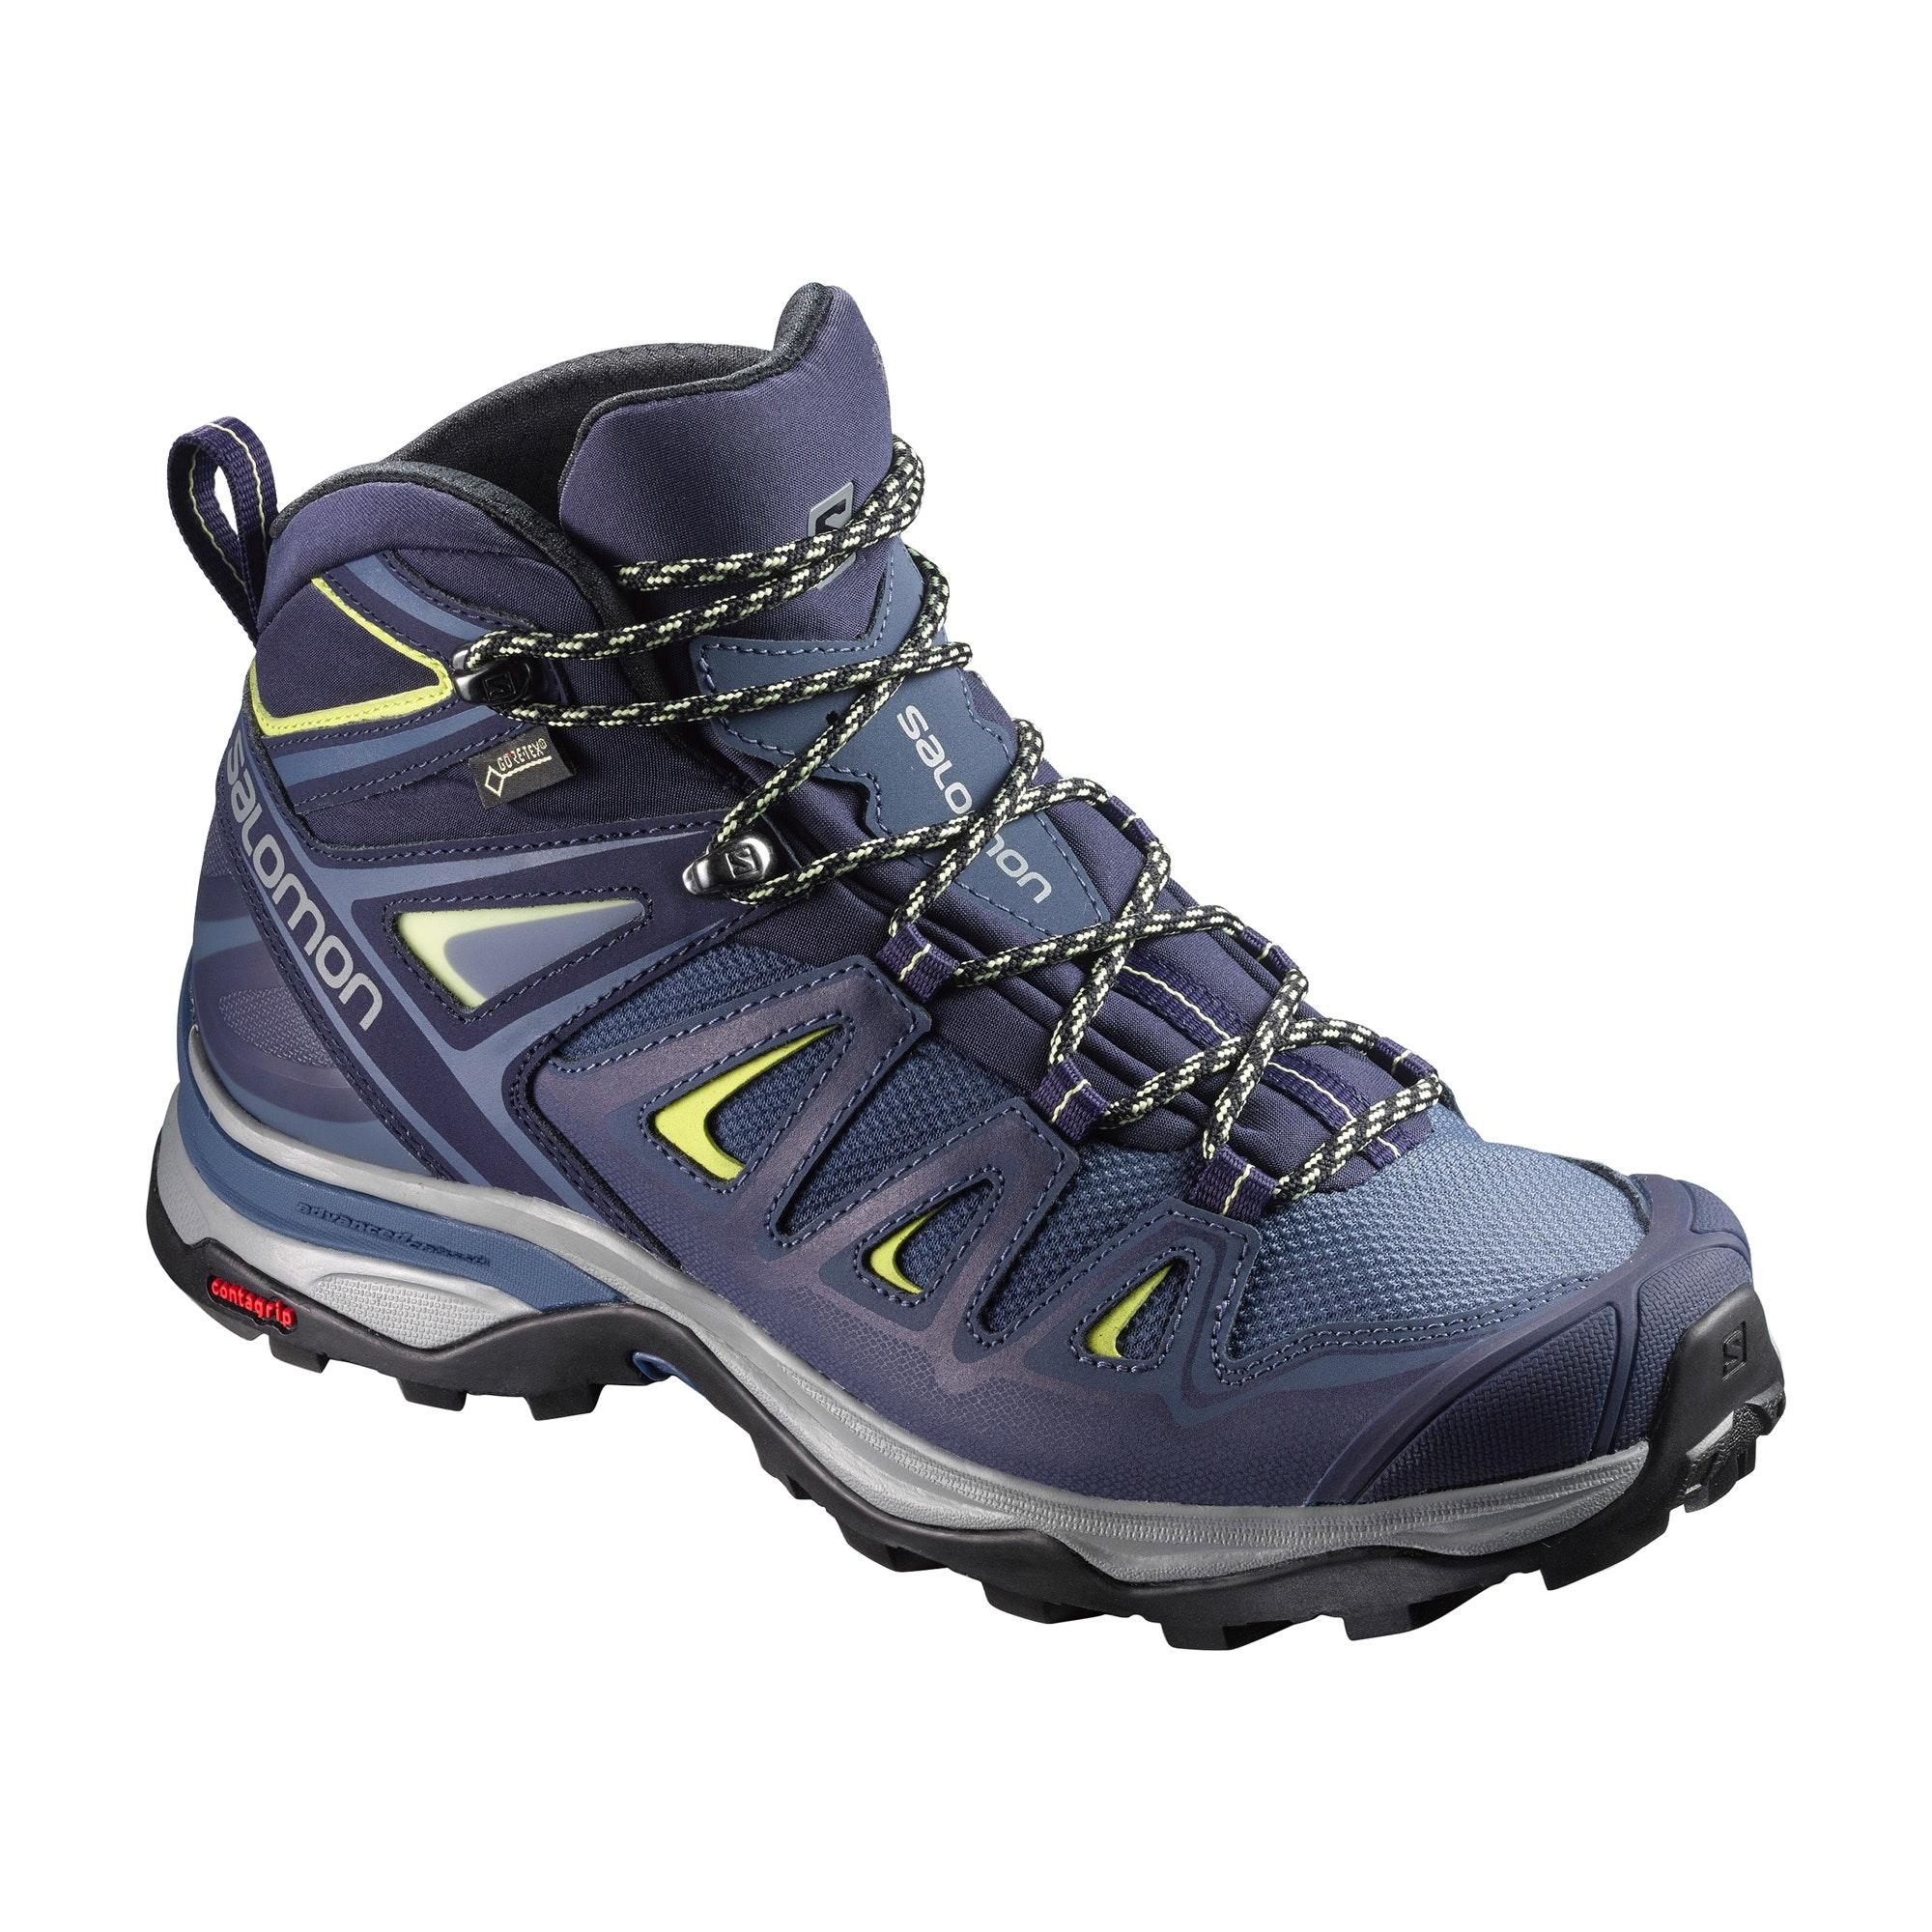 Salomon X Ultra 3 Mid GORE-TEX Women s Boots 4242a3bb26